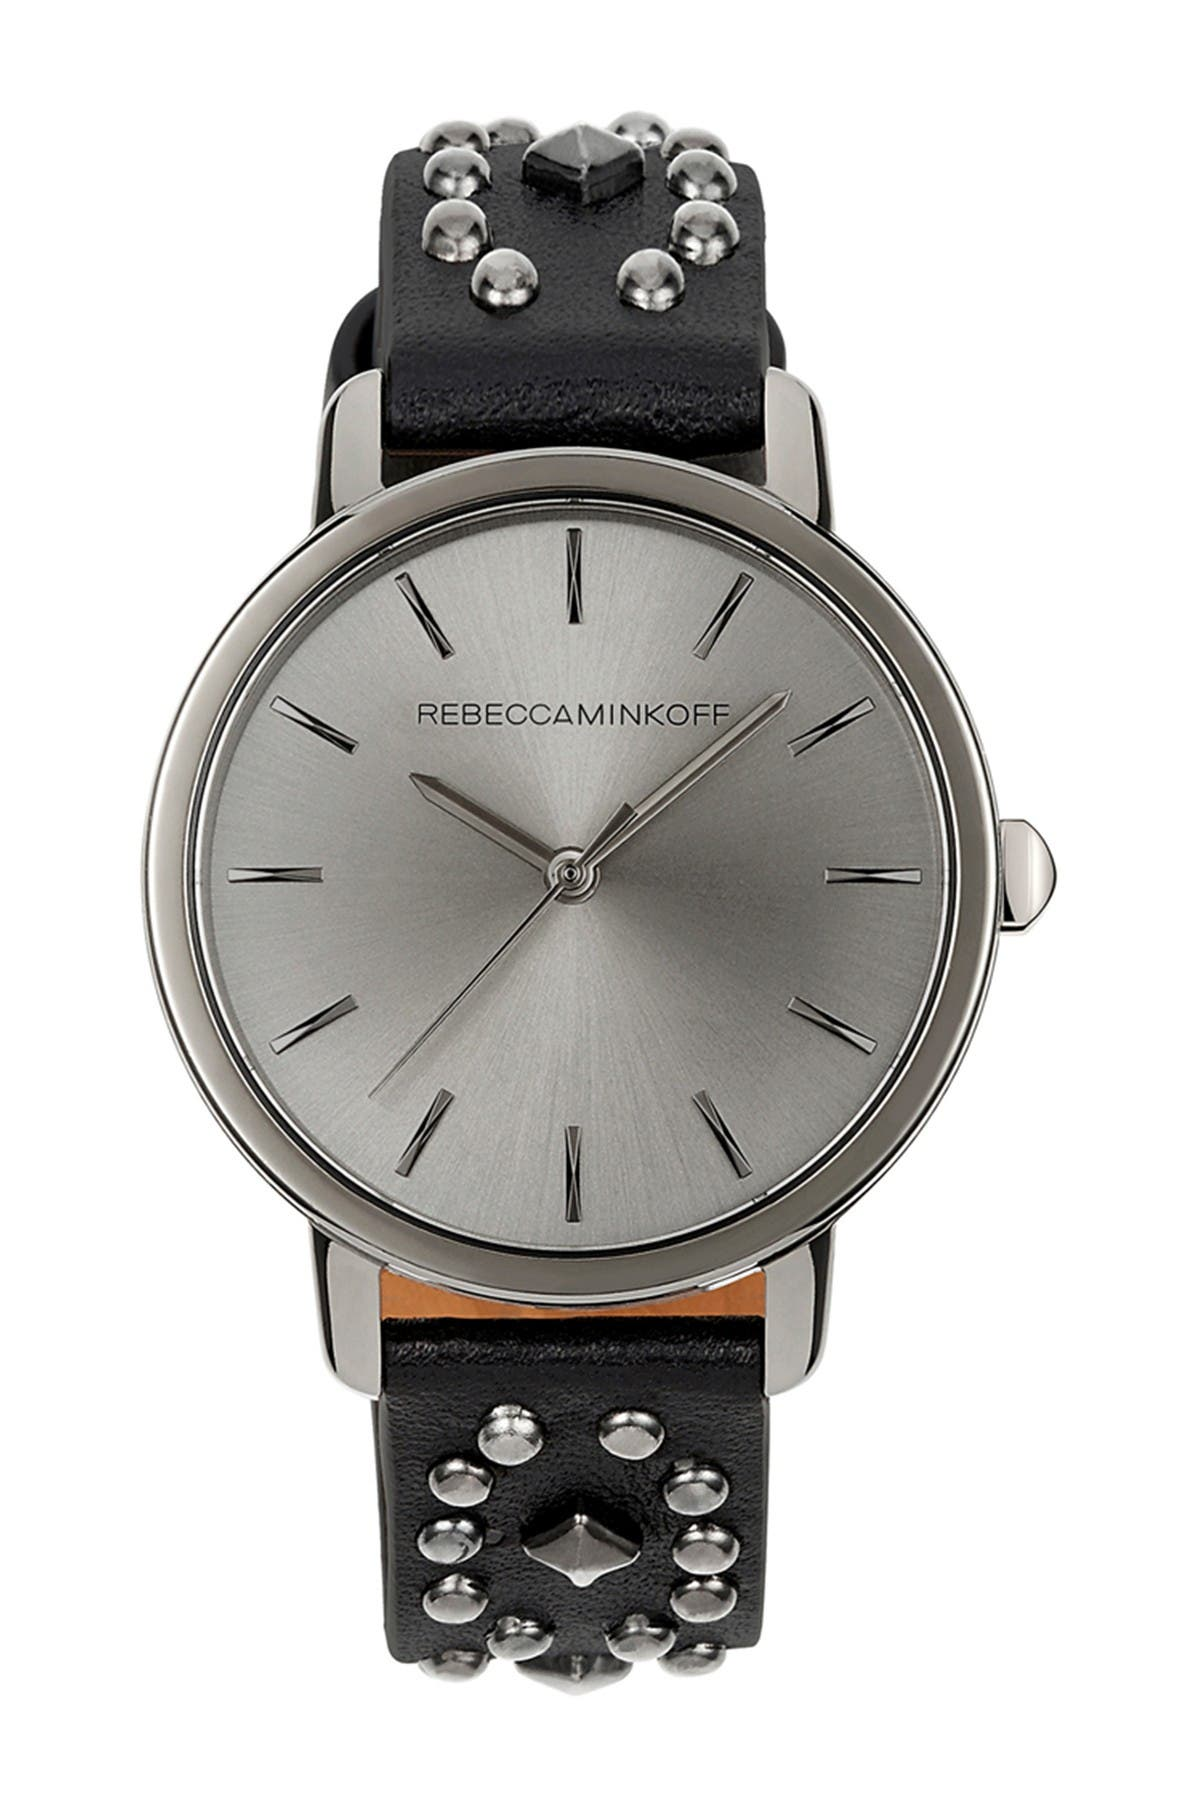 Image of Rebecca Minkoff Women's BFFL Studded Leather Strap Watch, 36mm